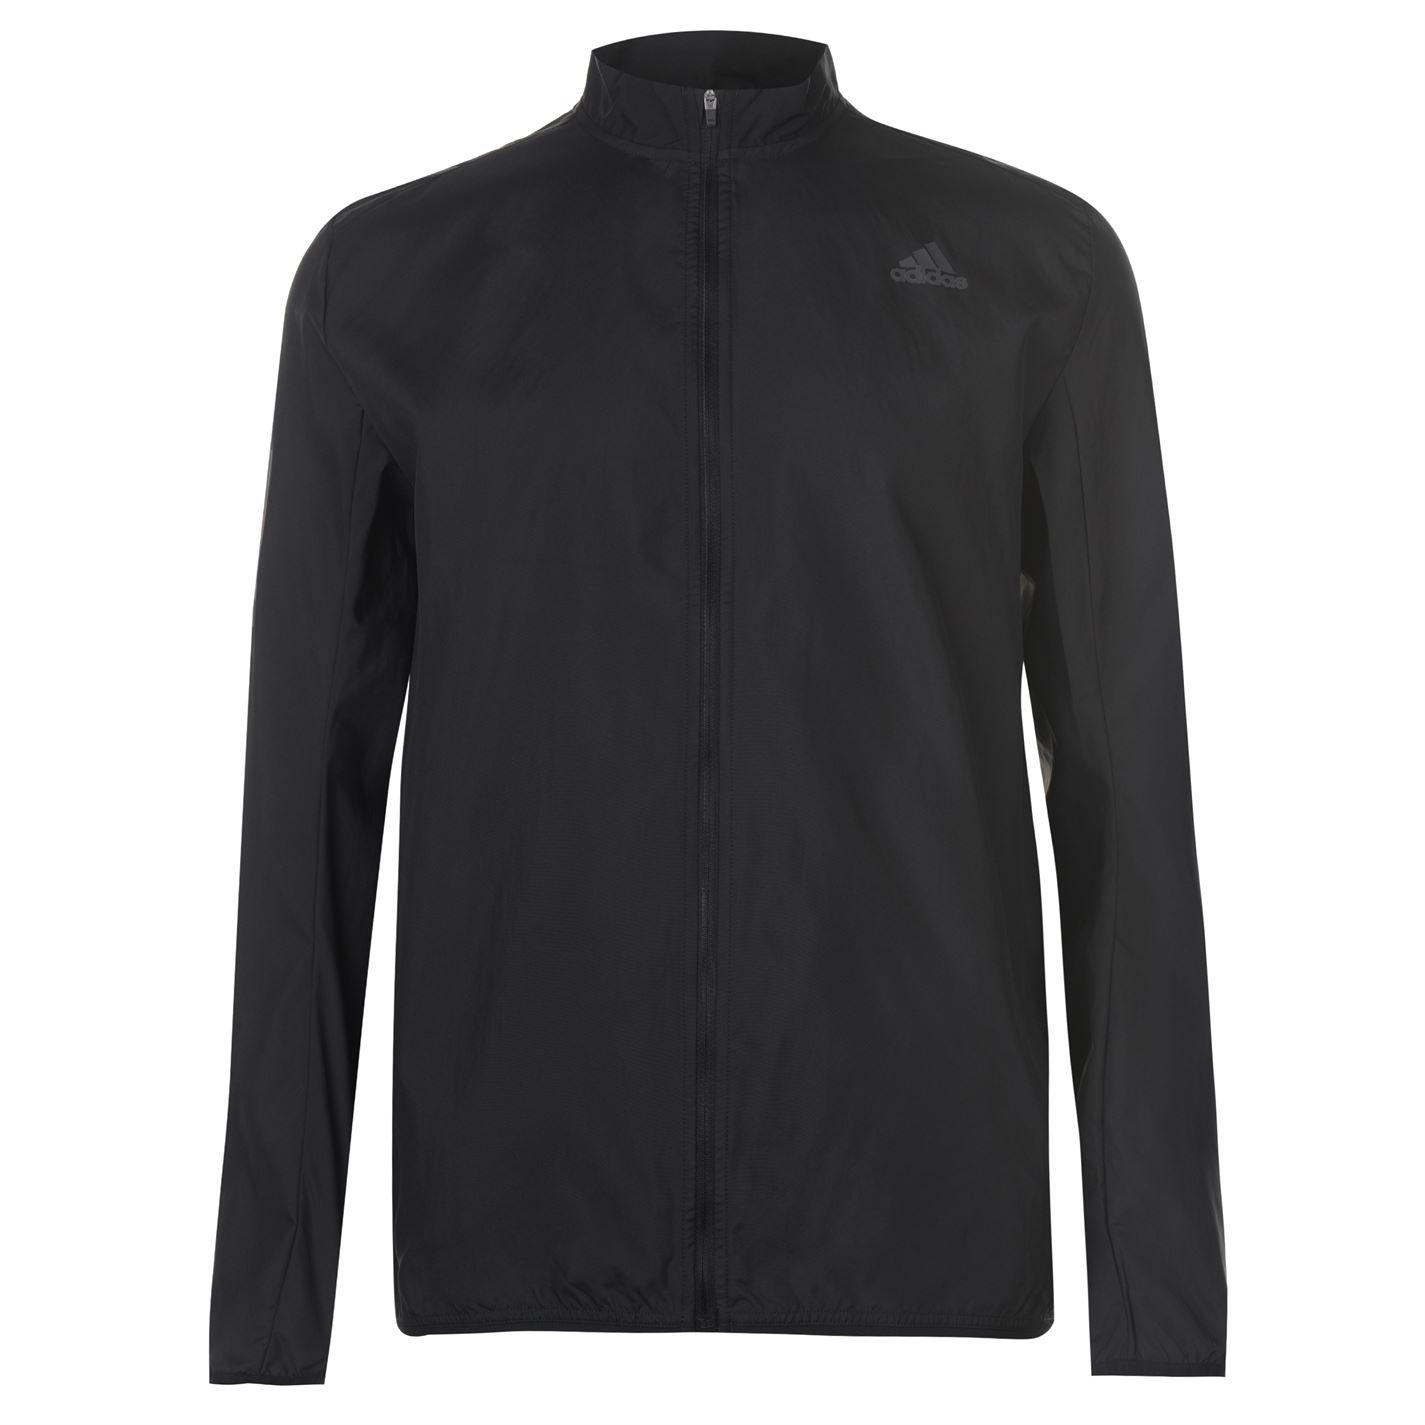 Nike SP Long Sleeve Half Zip T Shirt Mens